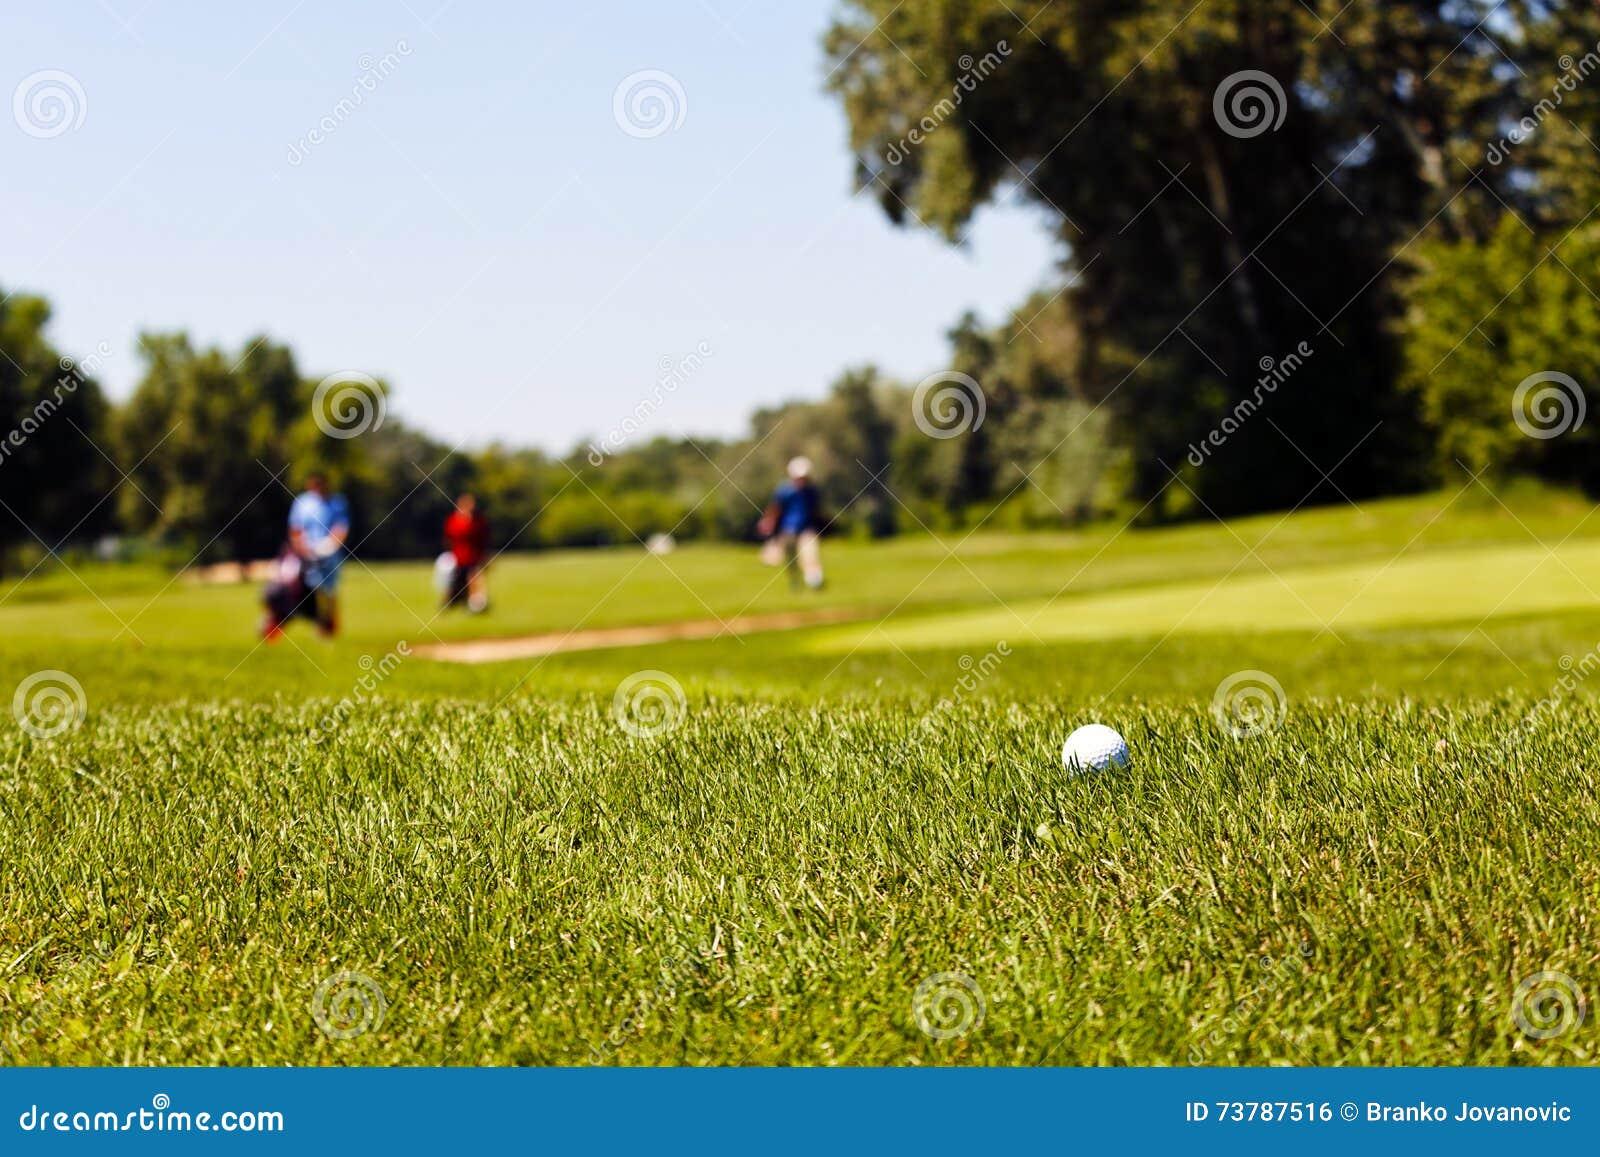 Golfcursus met spelers